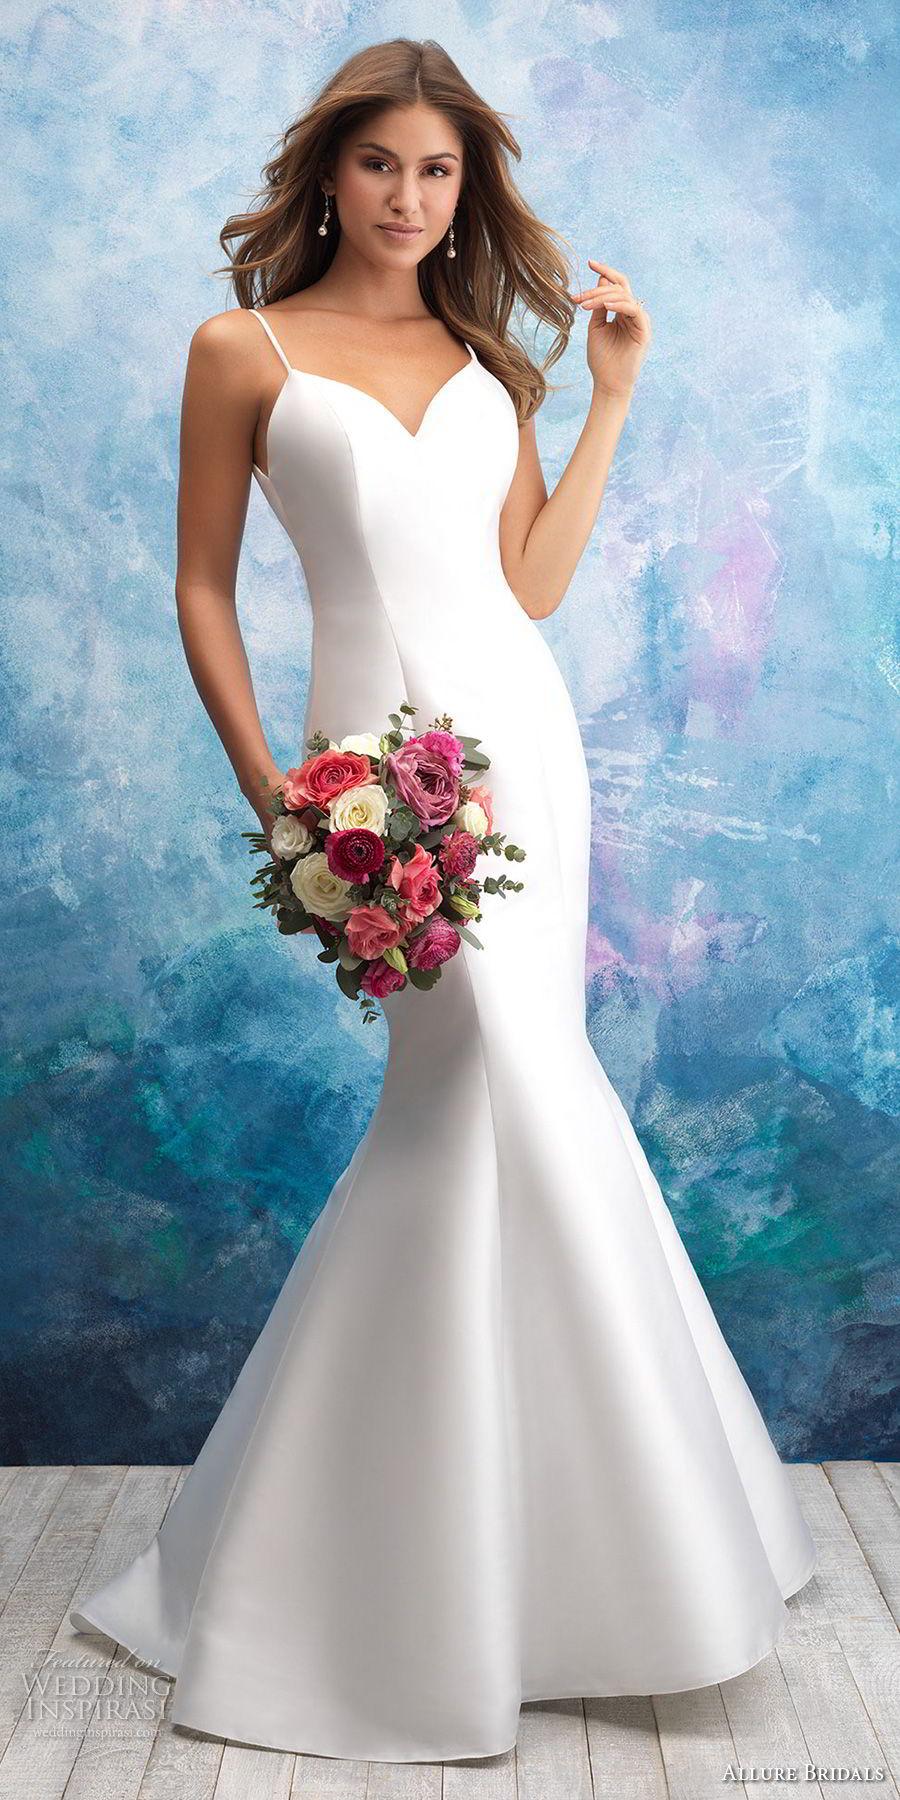 allure bridals fall 2018 bridal spaghetti strap sweetheart neckline simple minimalist eelgant mermaid wedding dress open back chapel train (15) mv